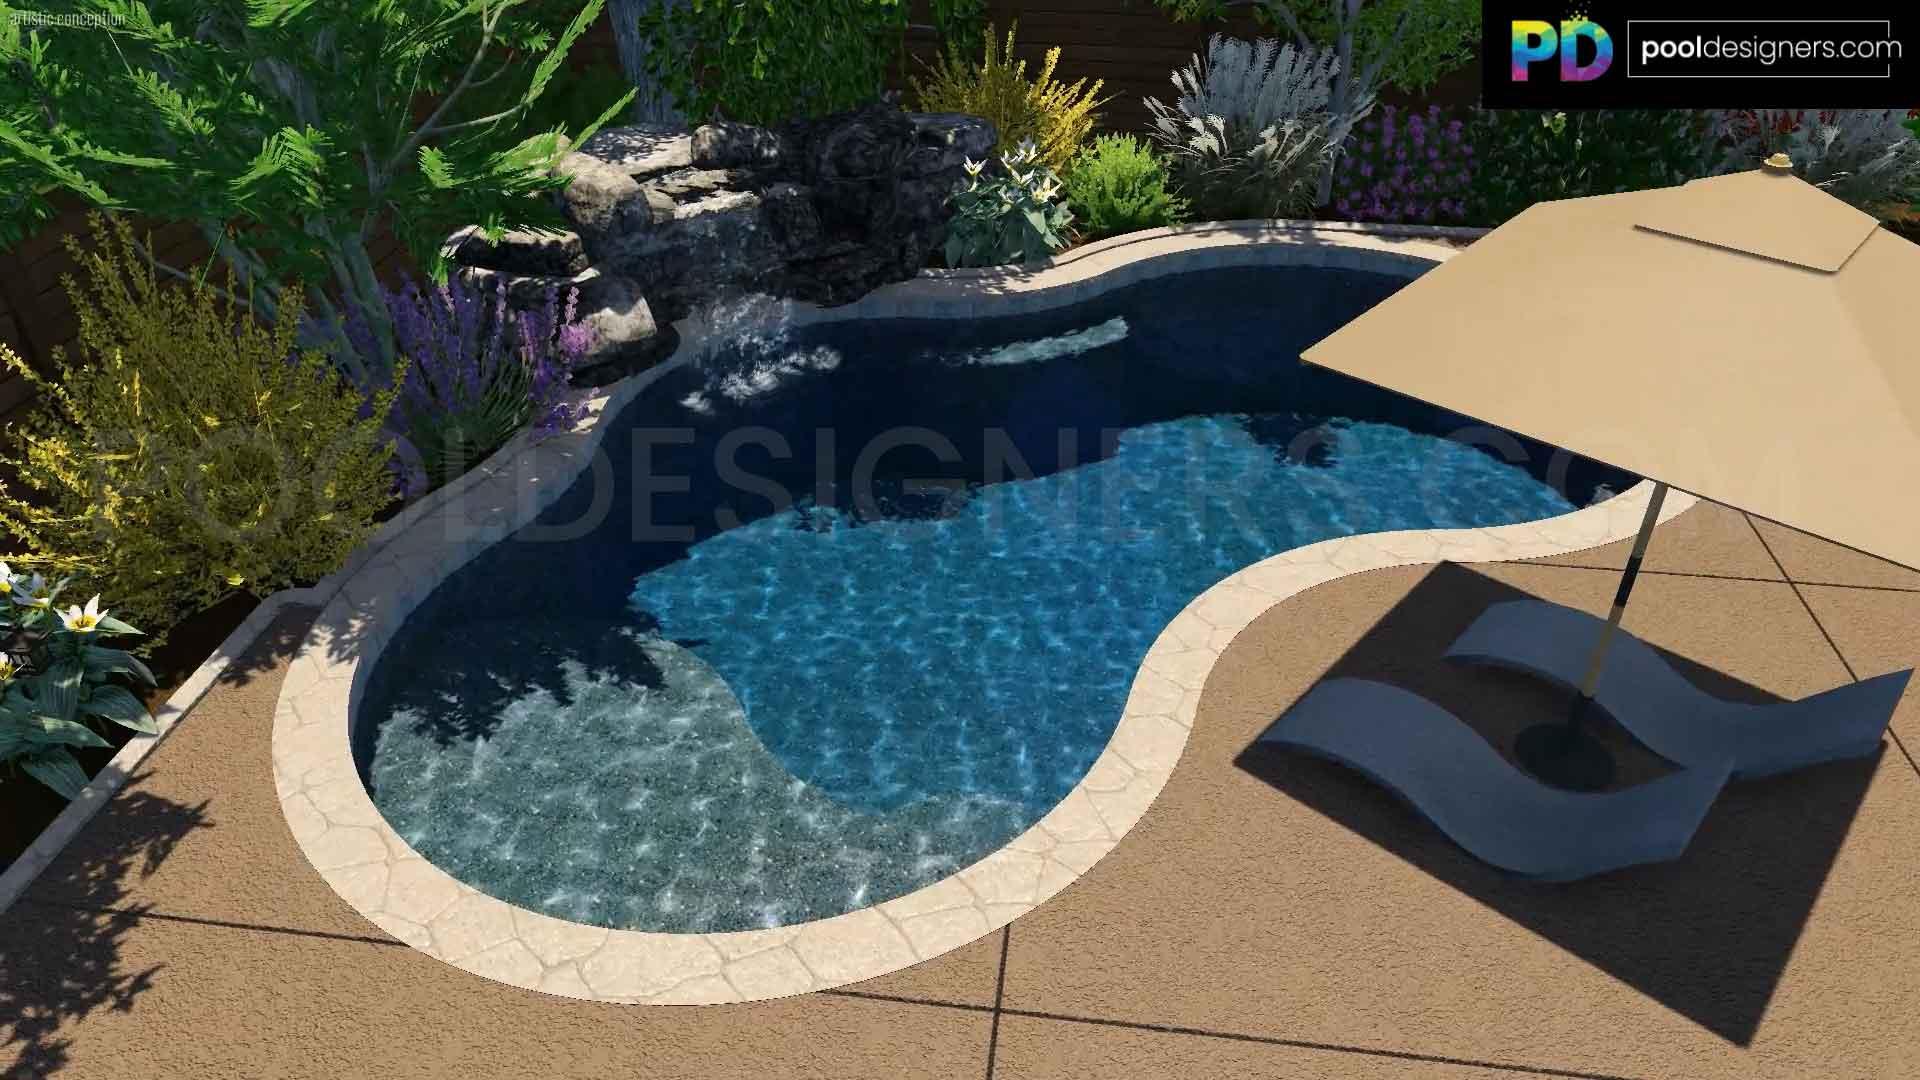 Freeform Pool Rock Waterfall Tanning Ledge Loungers Pd53 3d Pool Design Pool Designers Buy 3d Pool Designs Online From Expert 3d Pool Designers